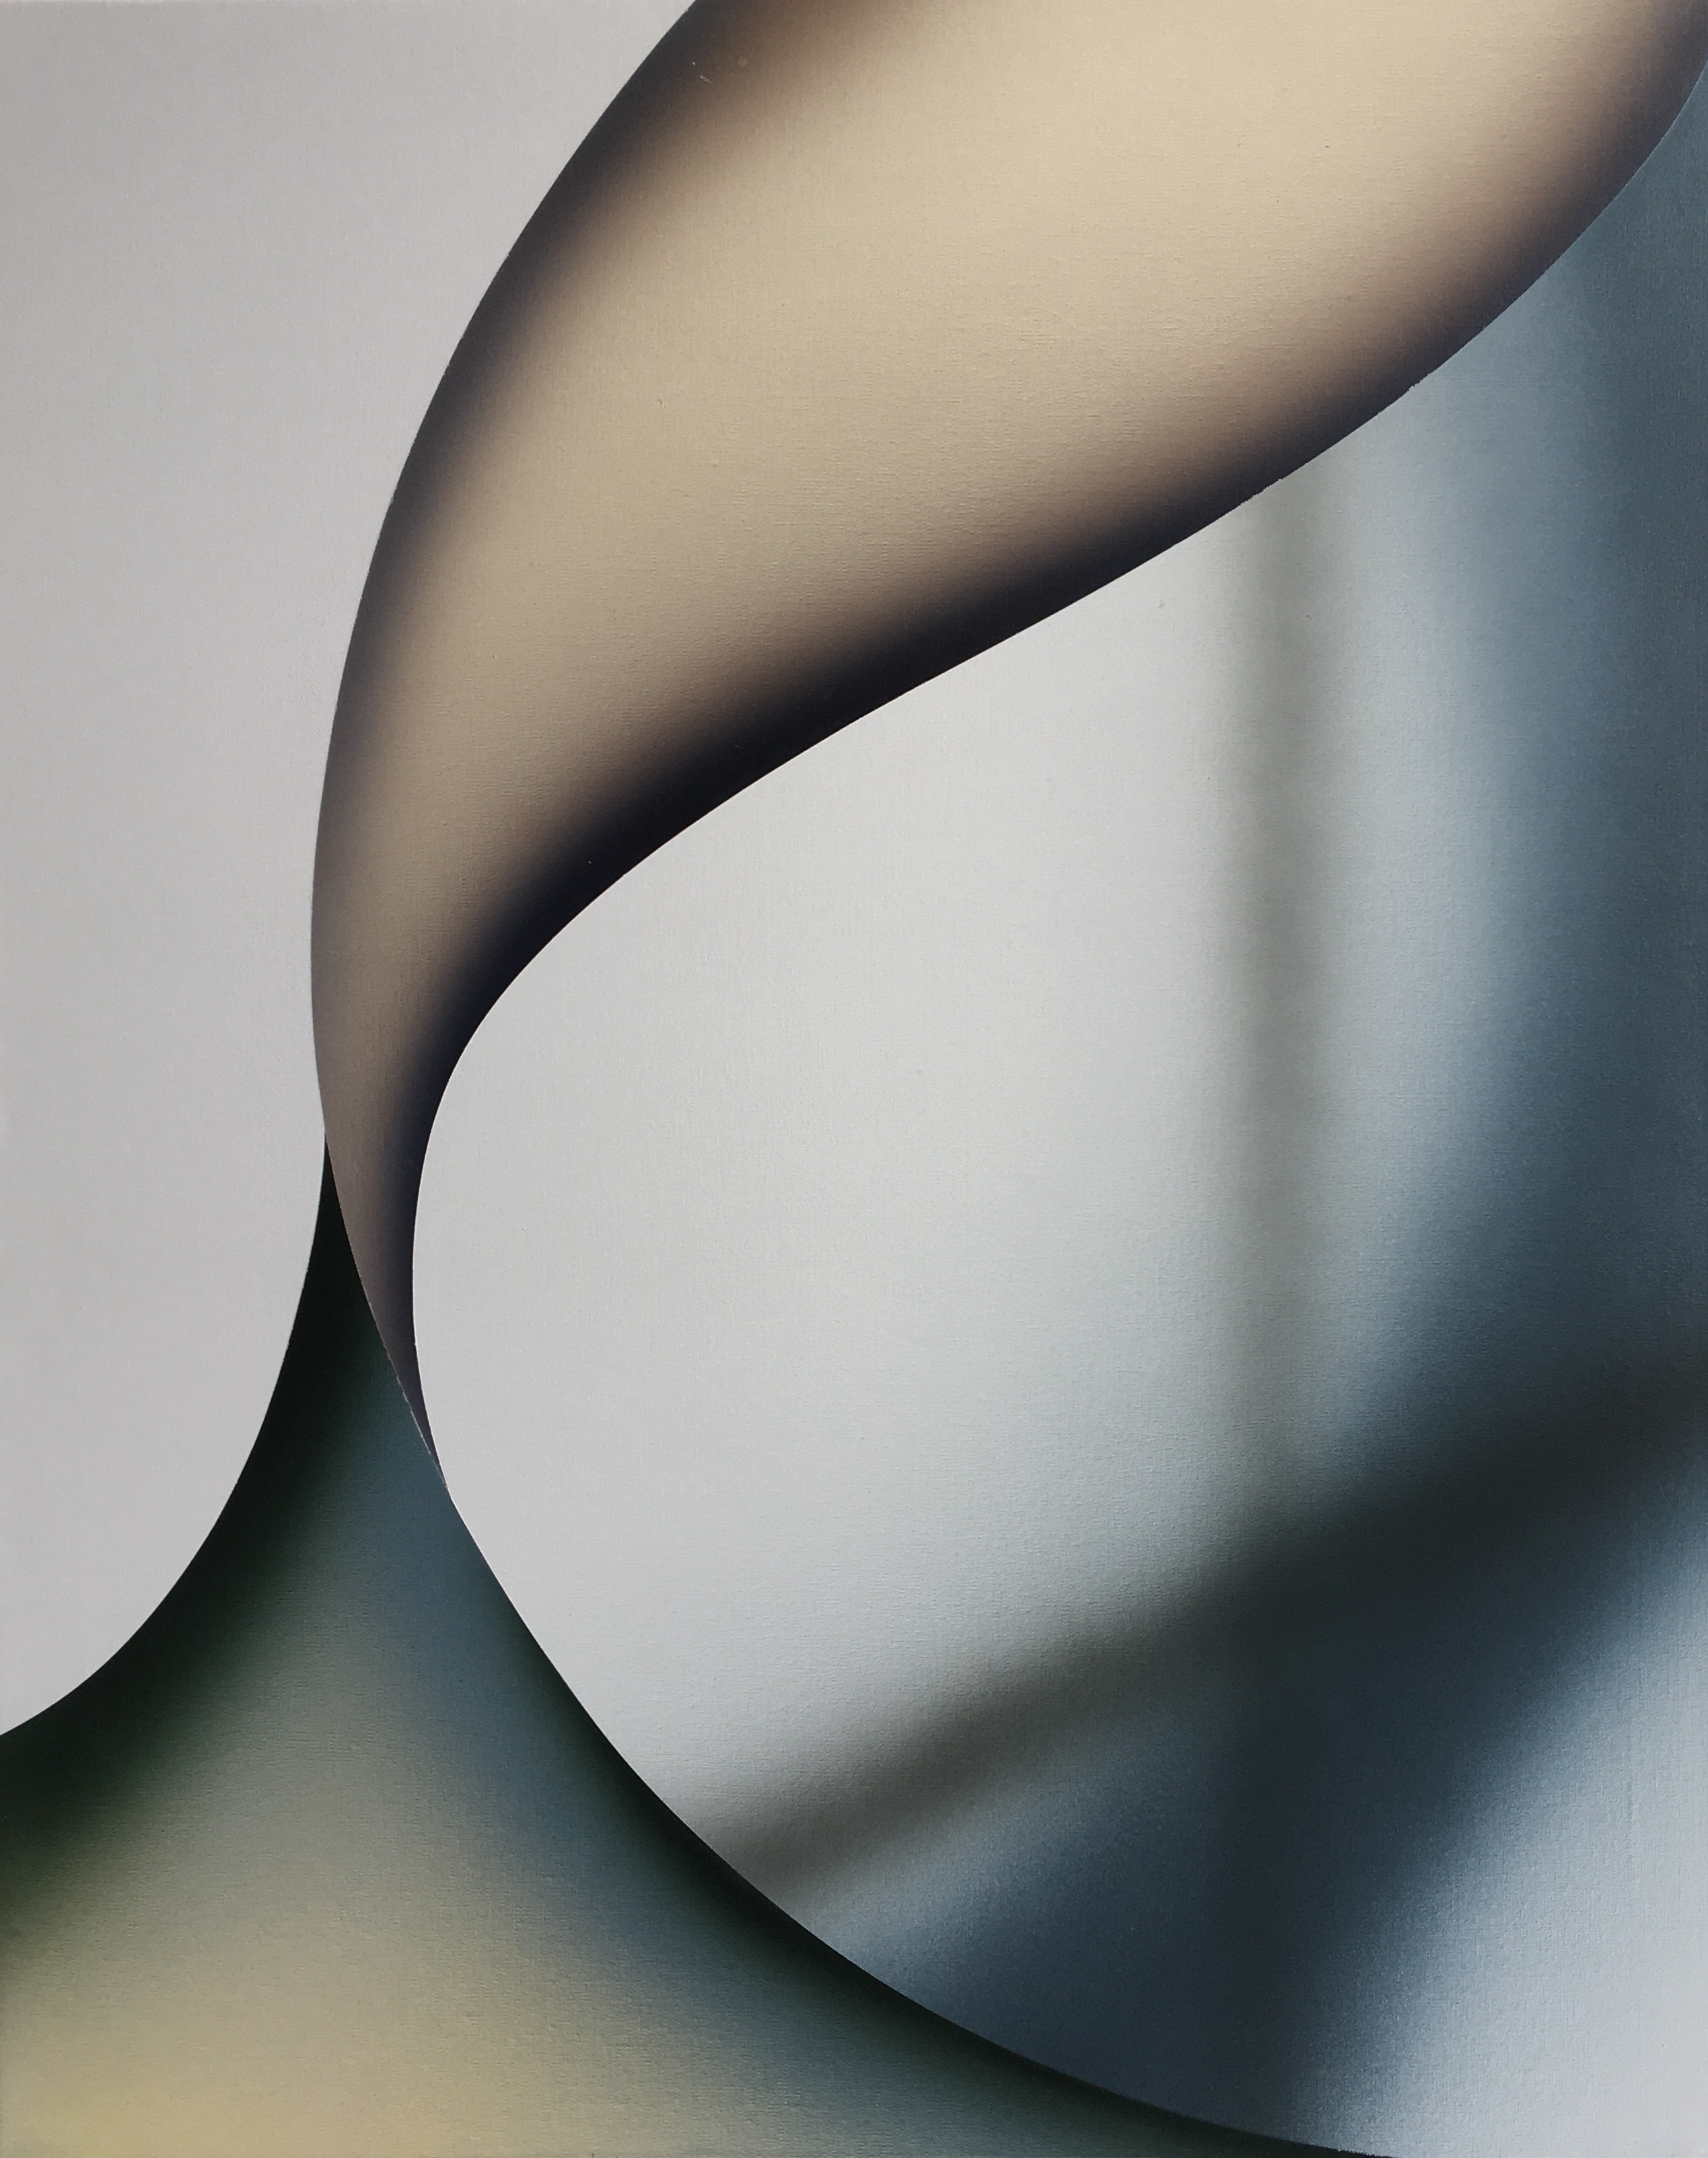 Rufus Knight-Webb: Wave Shadow #2,18